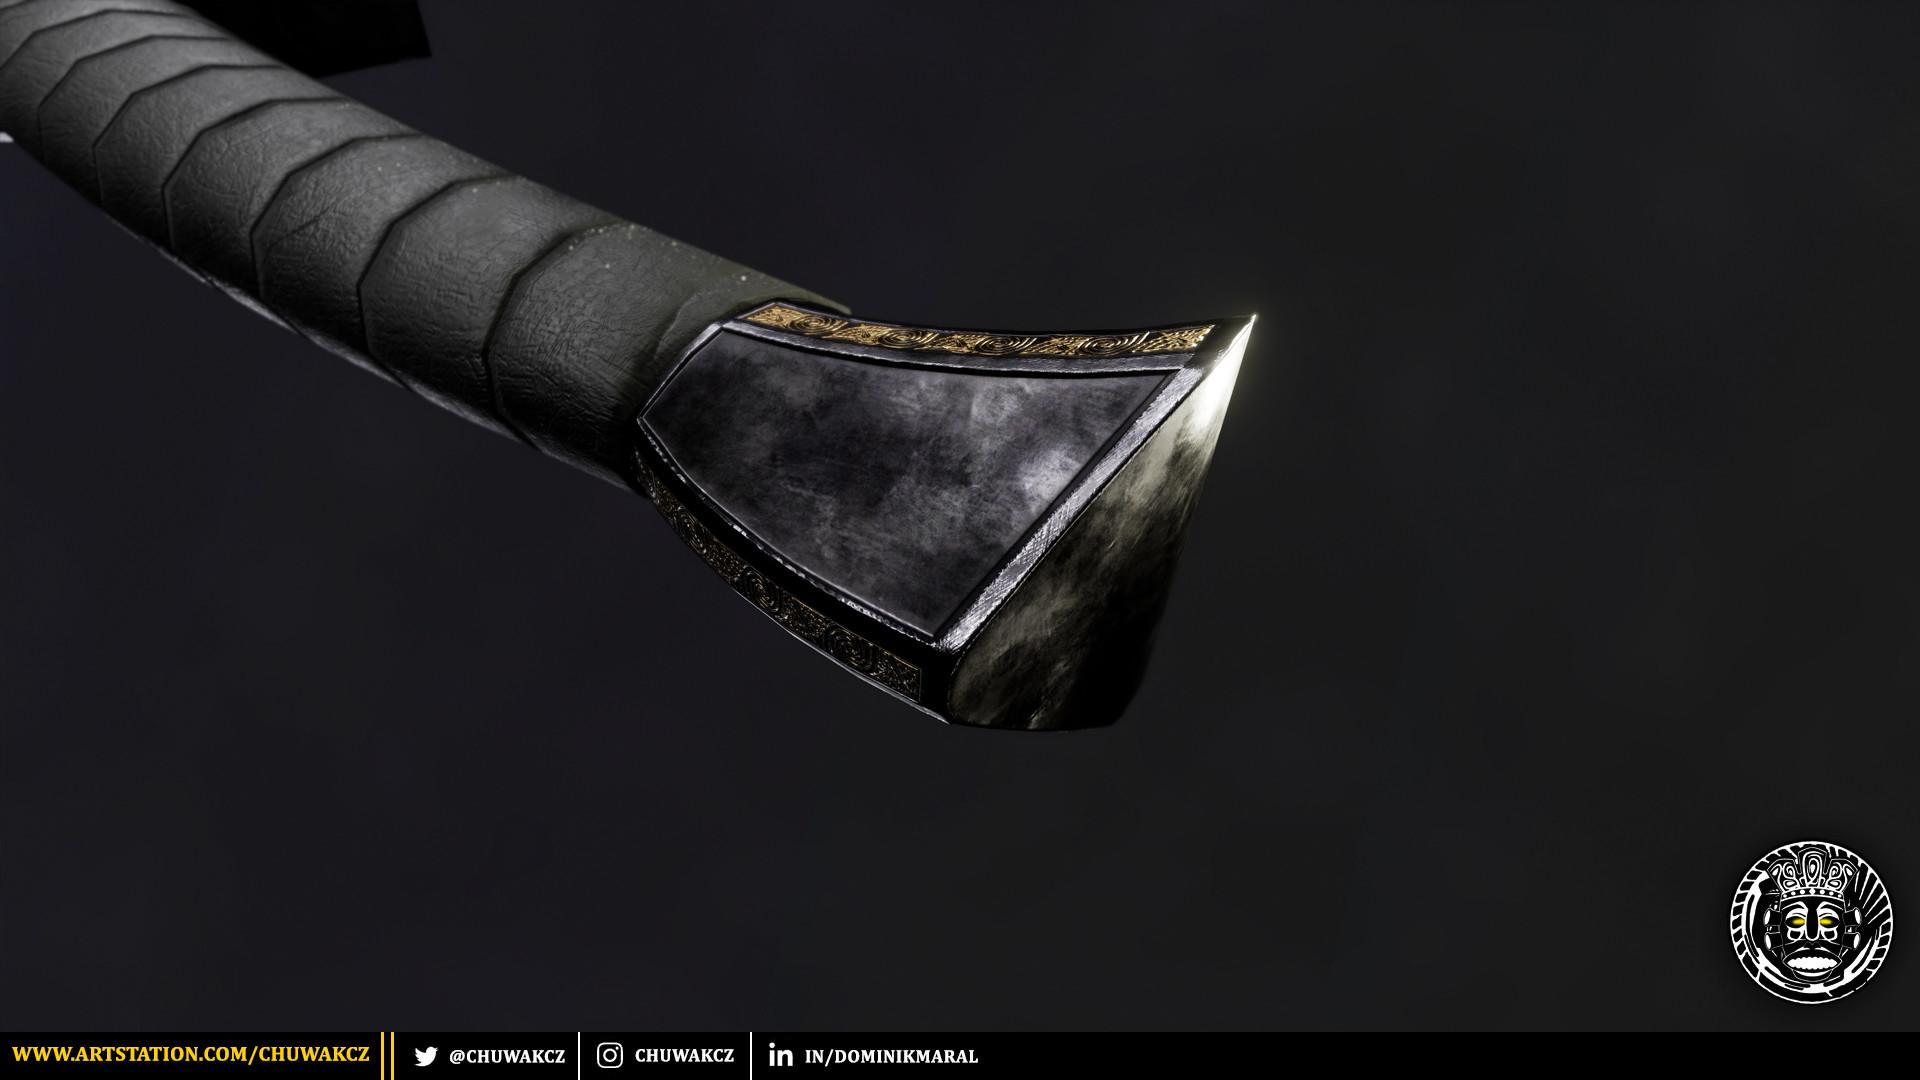 Dominik maral obsidianpommel2